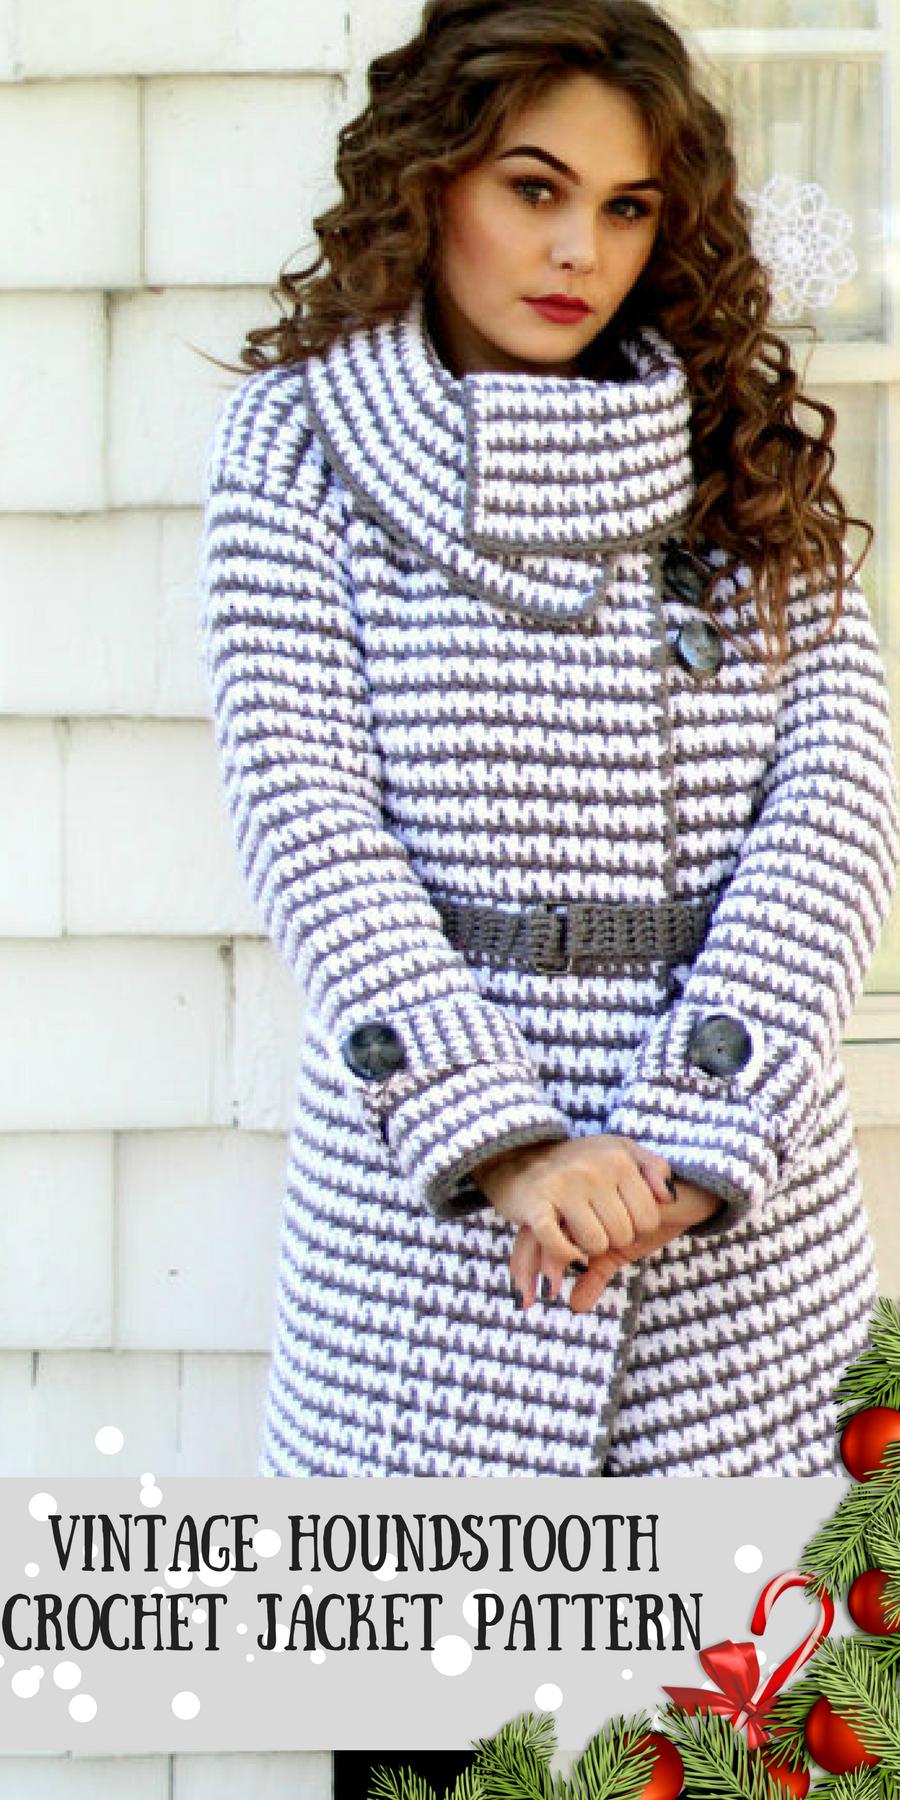 Beautiful vintage crochet houndstooth pattern jacket for women beautiful vintage crochet houndstooth pattern jacket for women absolutely gorgeous how creative crochetjacket dt1010fo